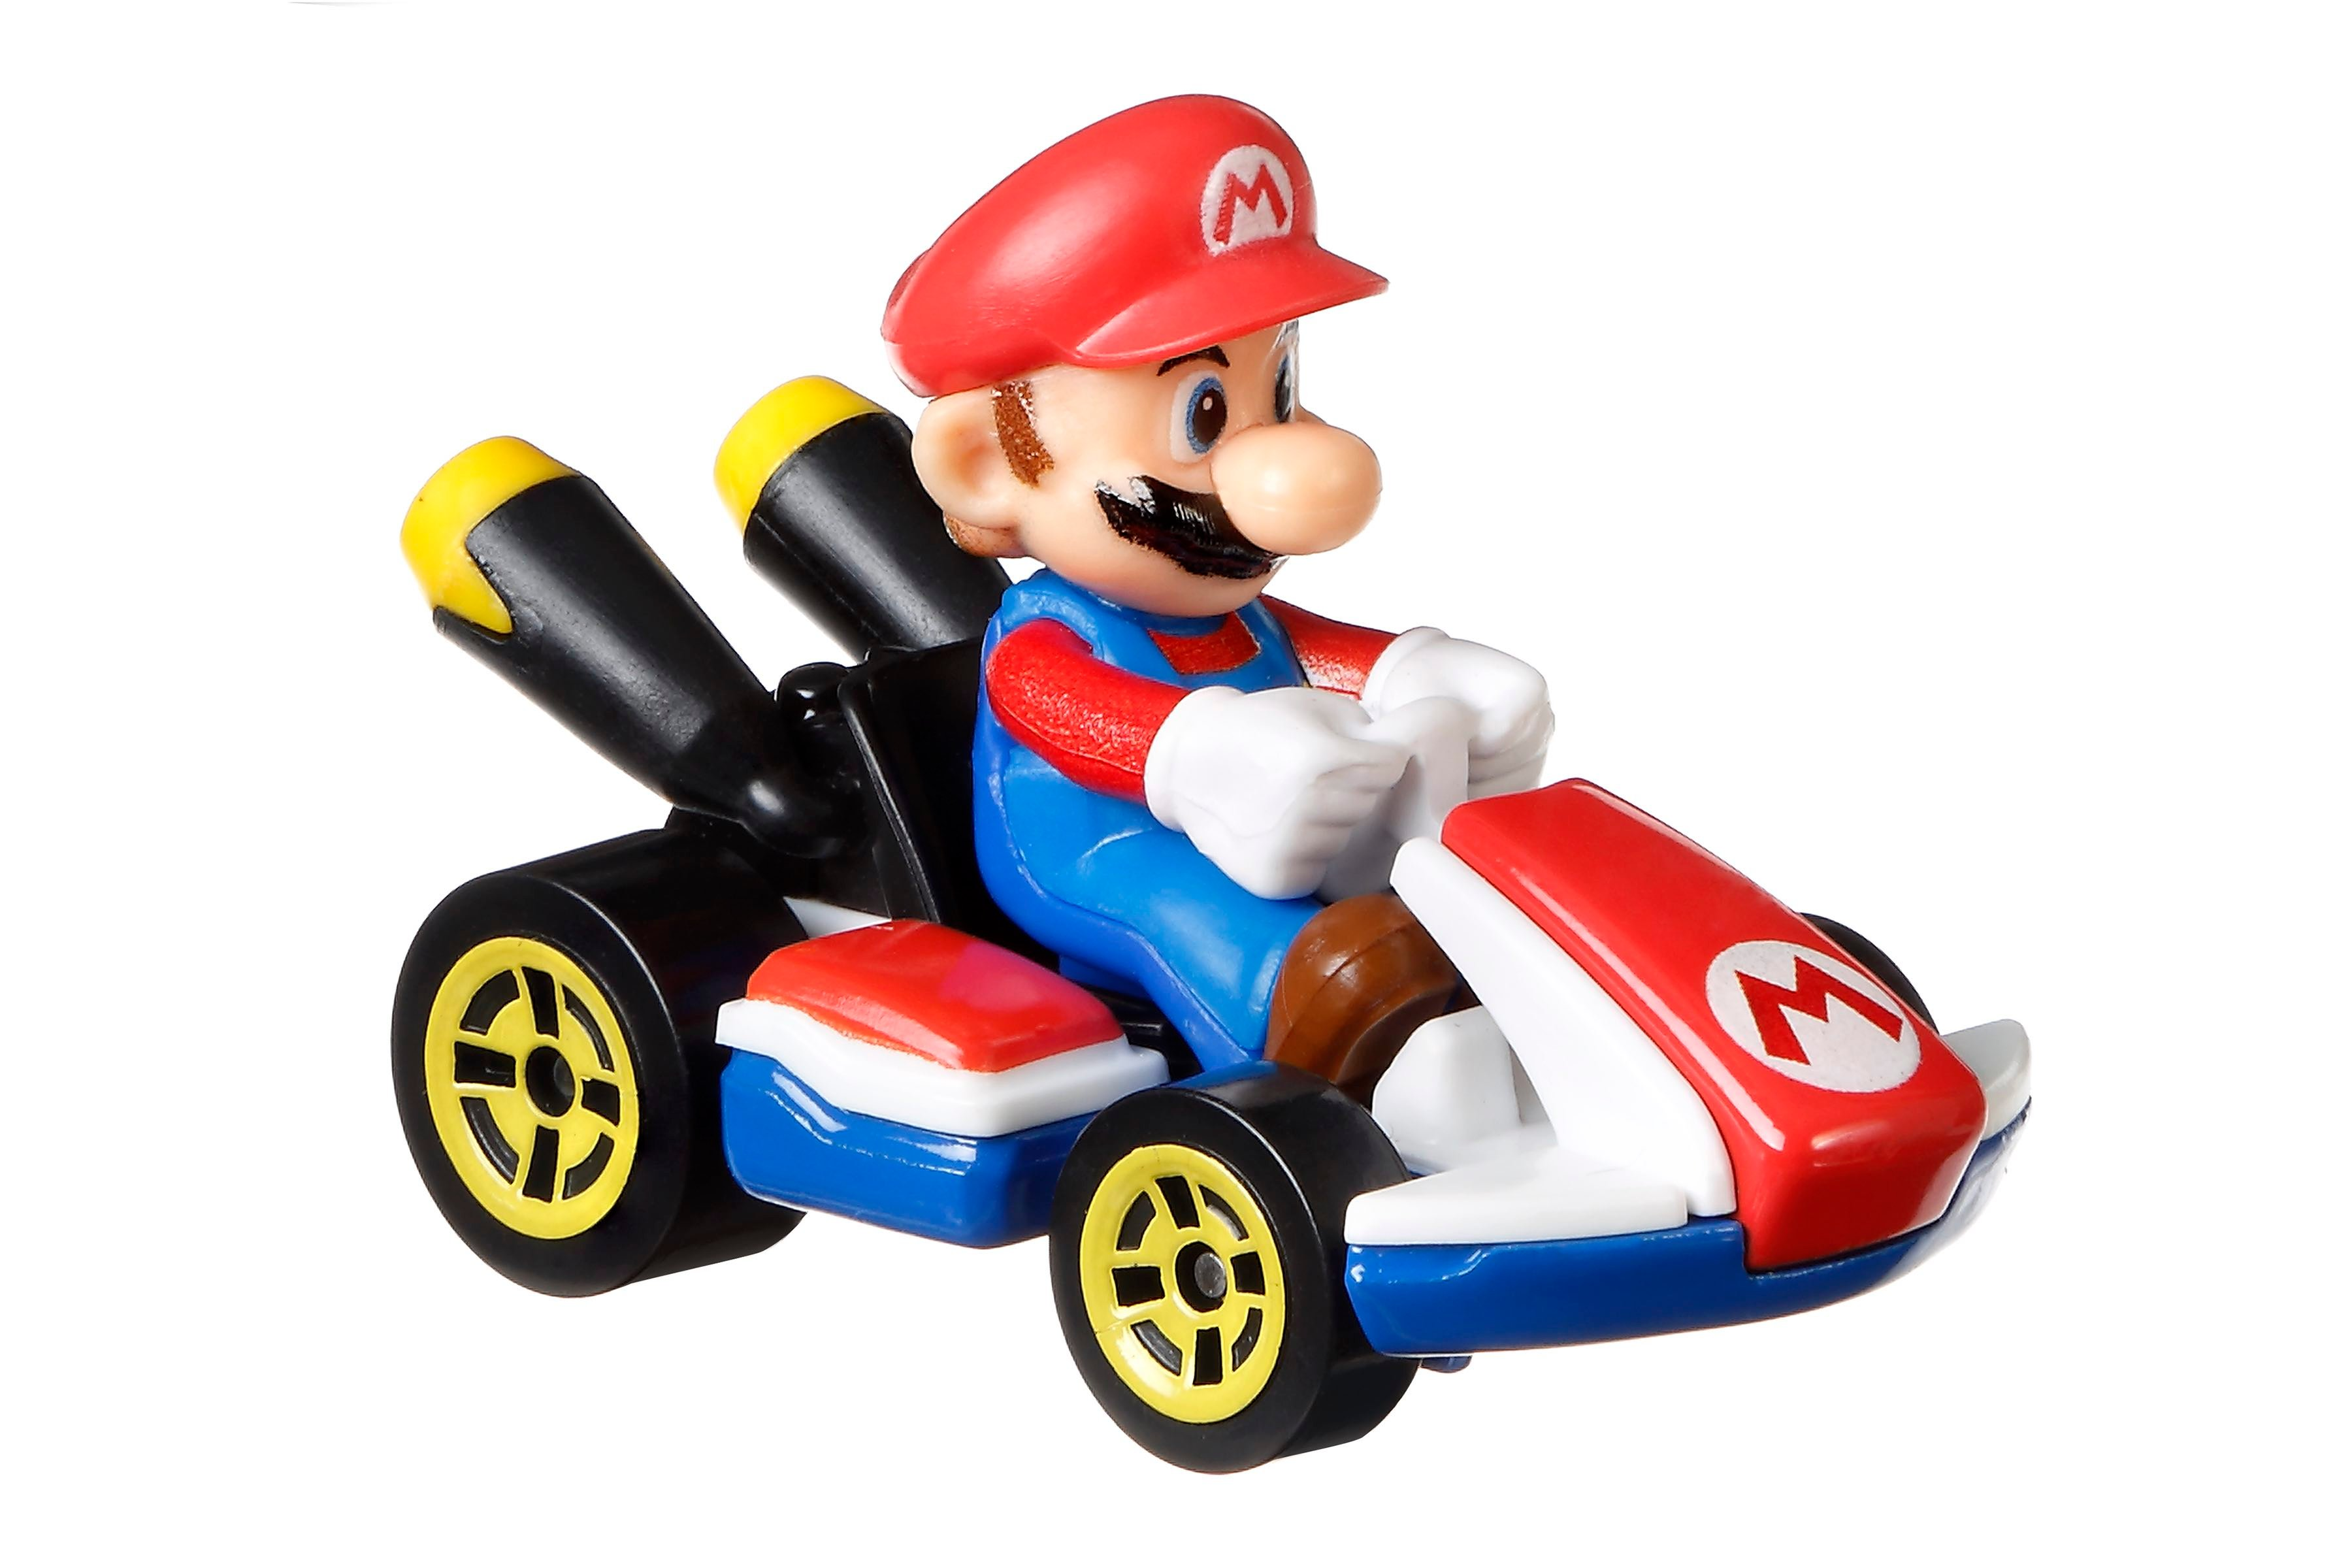 Hot Wheels Mario die-cast